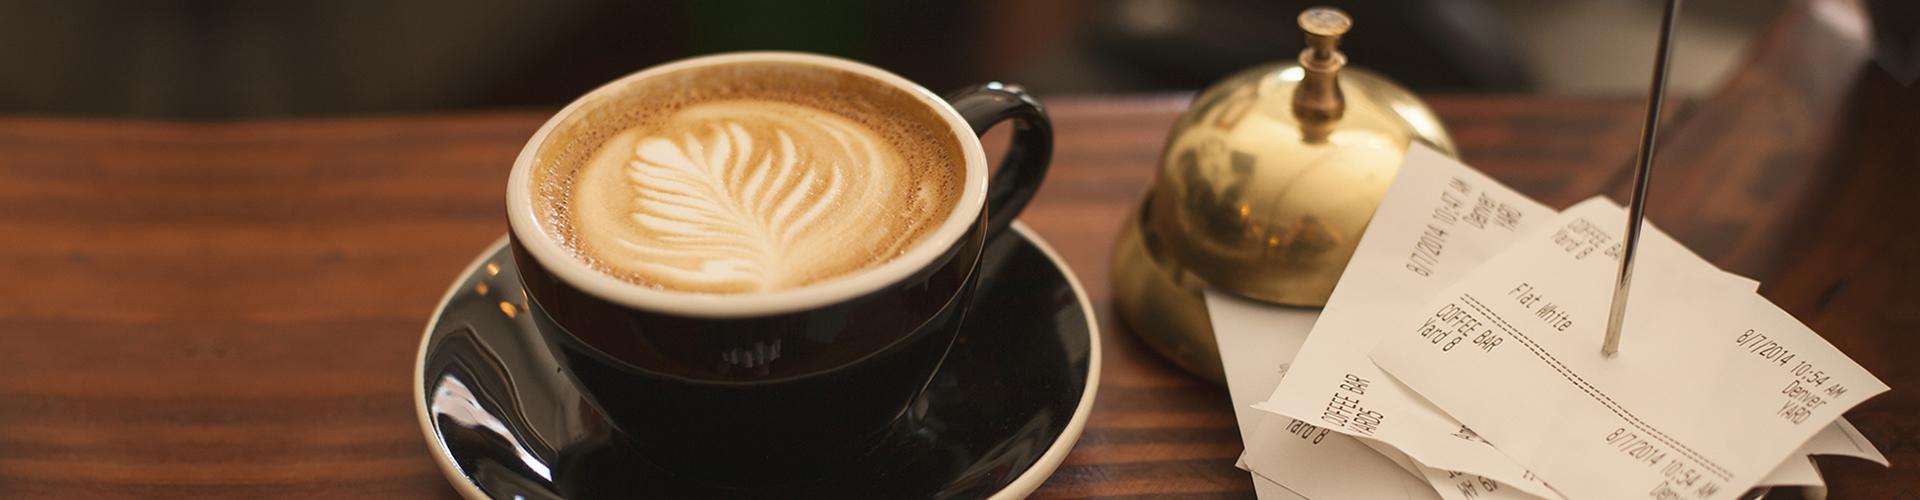 Banner 1 - Café